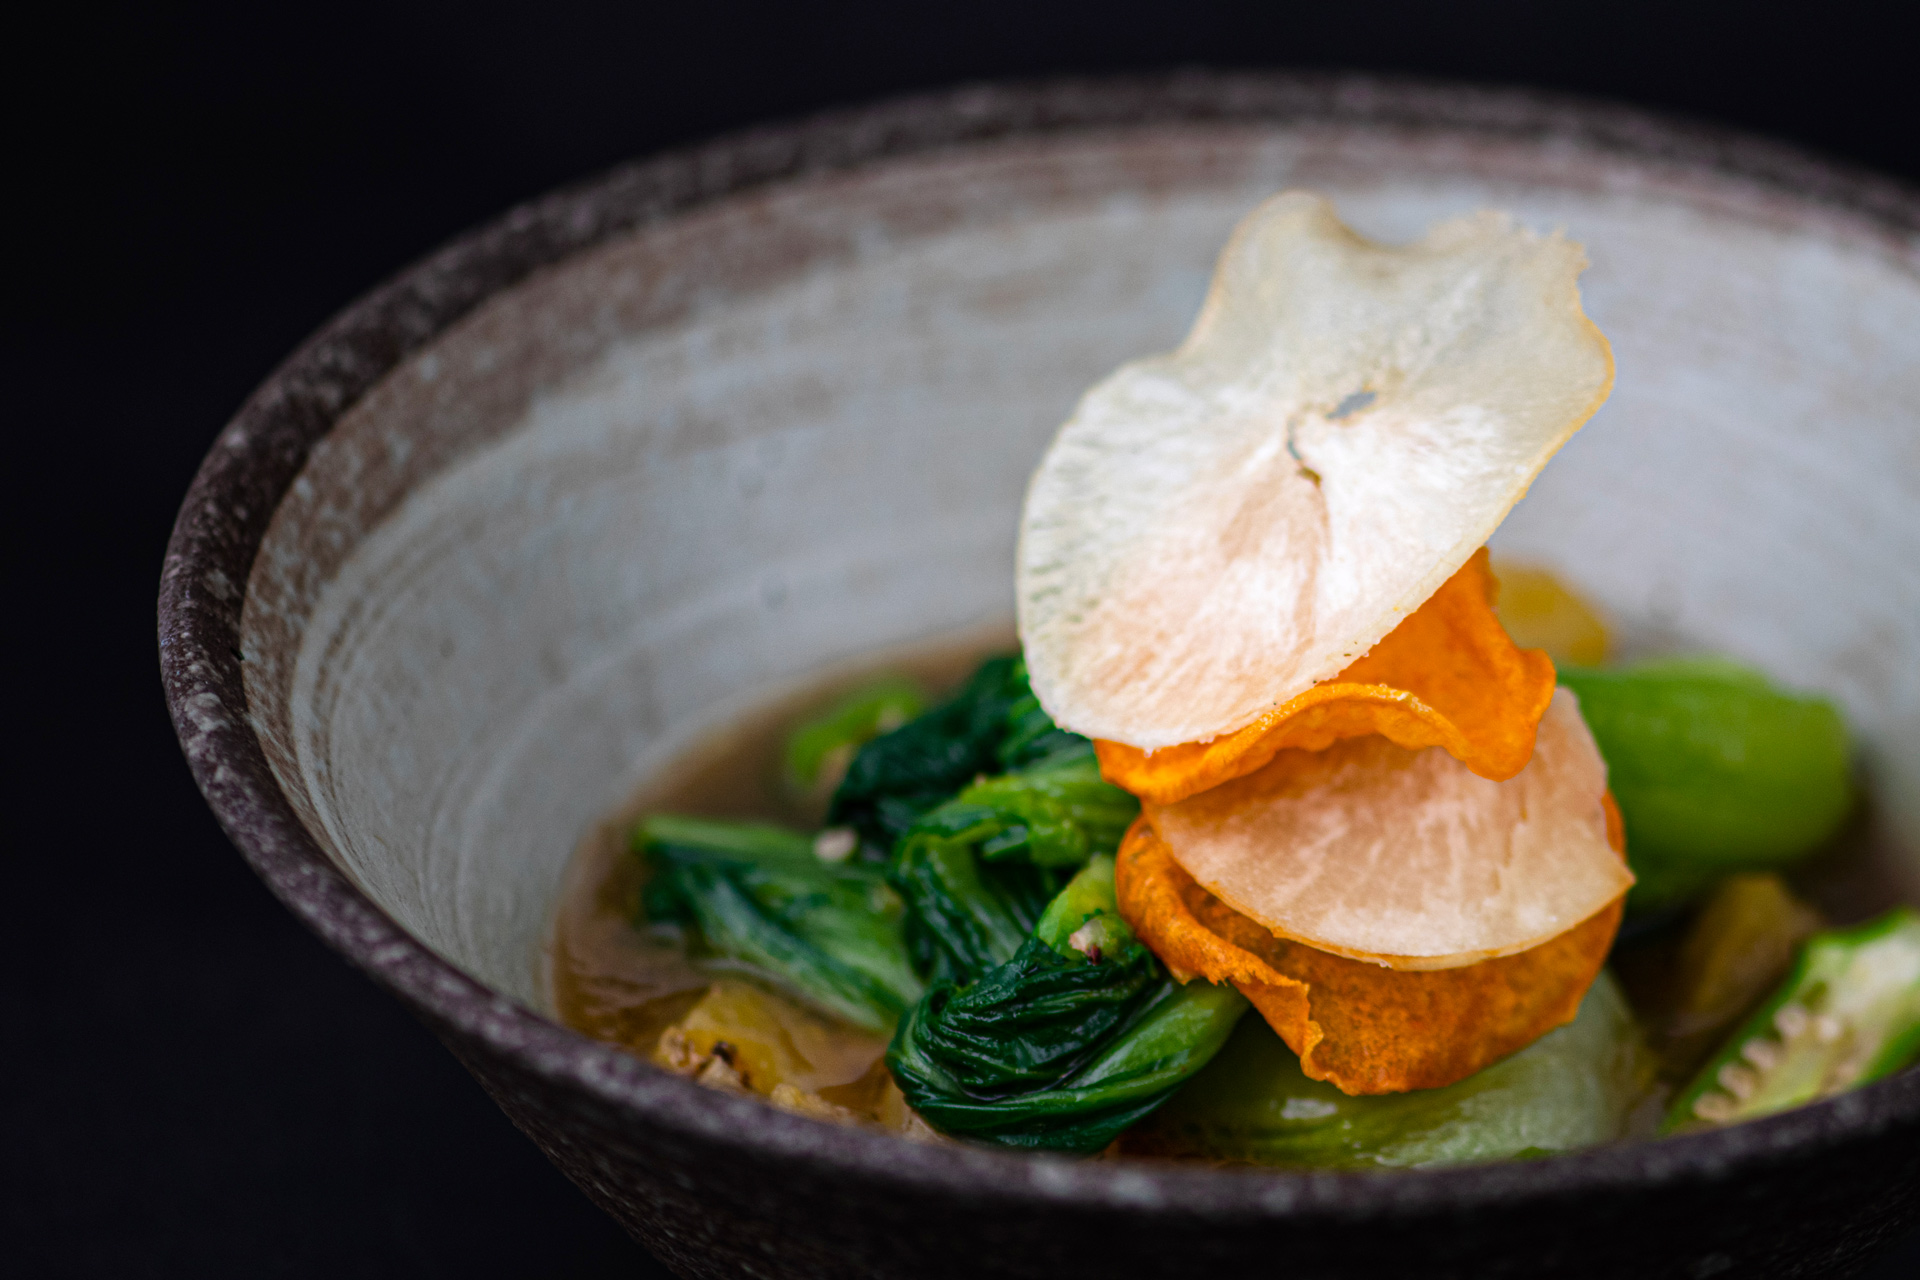 Vegan bok choy broth recipe inspired by African cuisine from Yasomo by Chef Mick Élysée